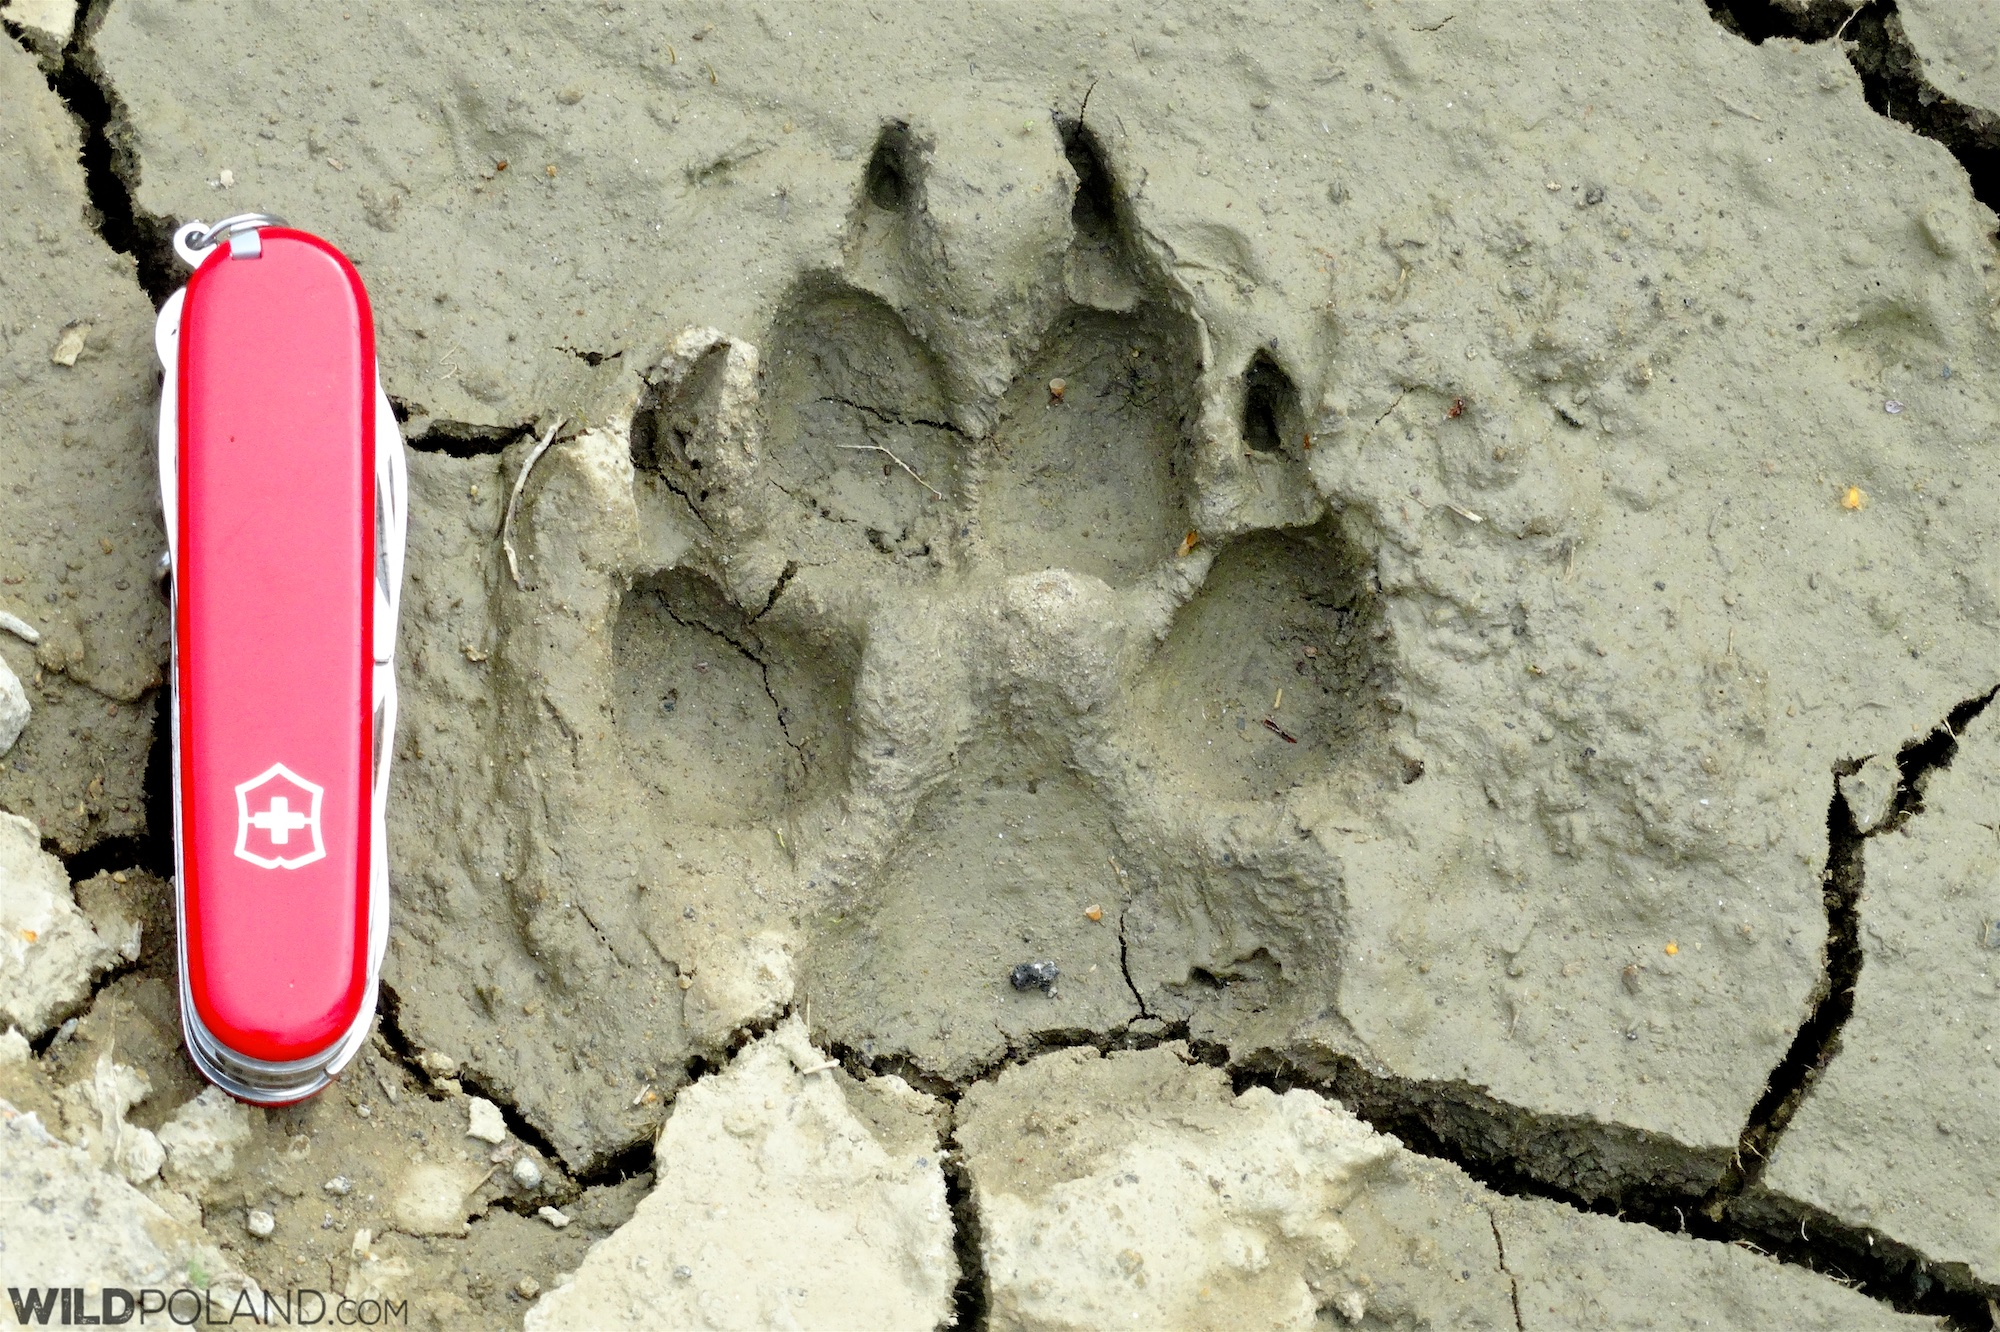 Wolf footprint in the Bieszczady Mountains, Eastern Carpathians